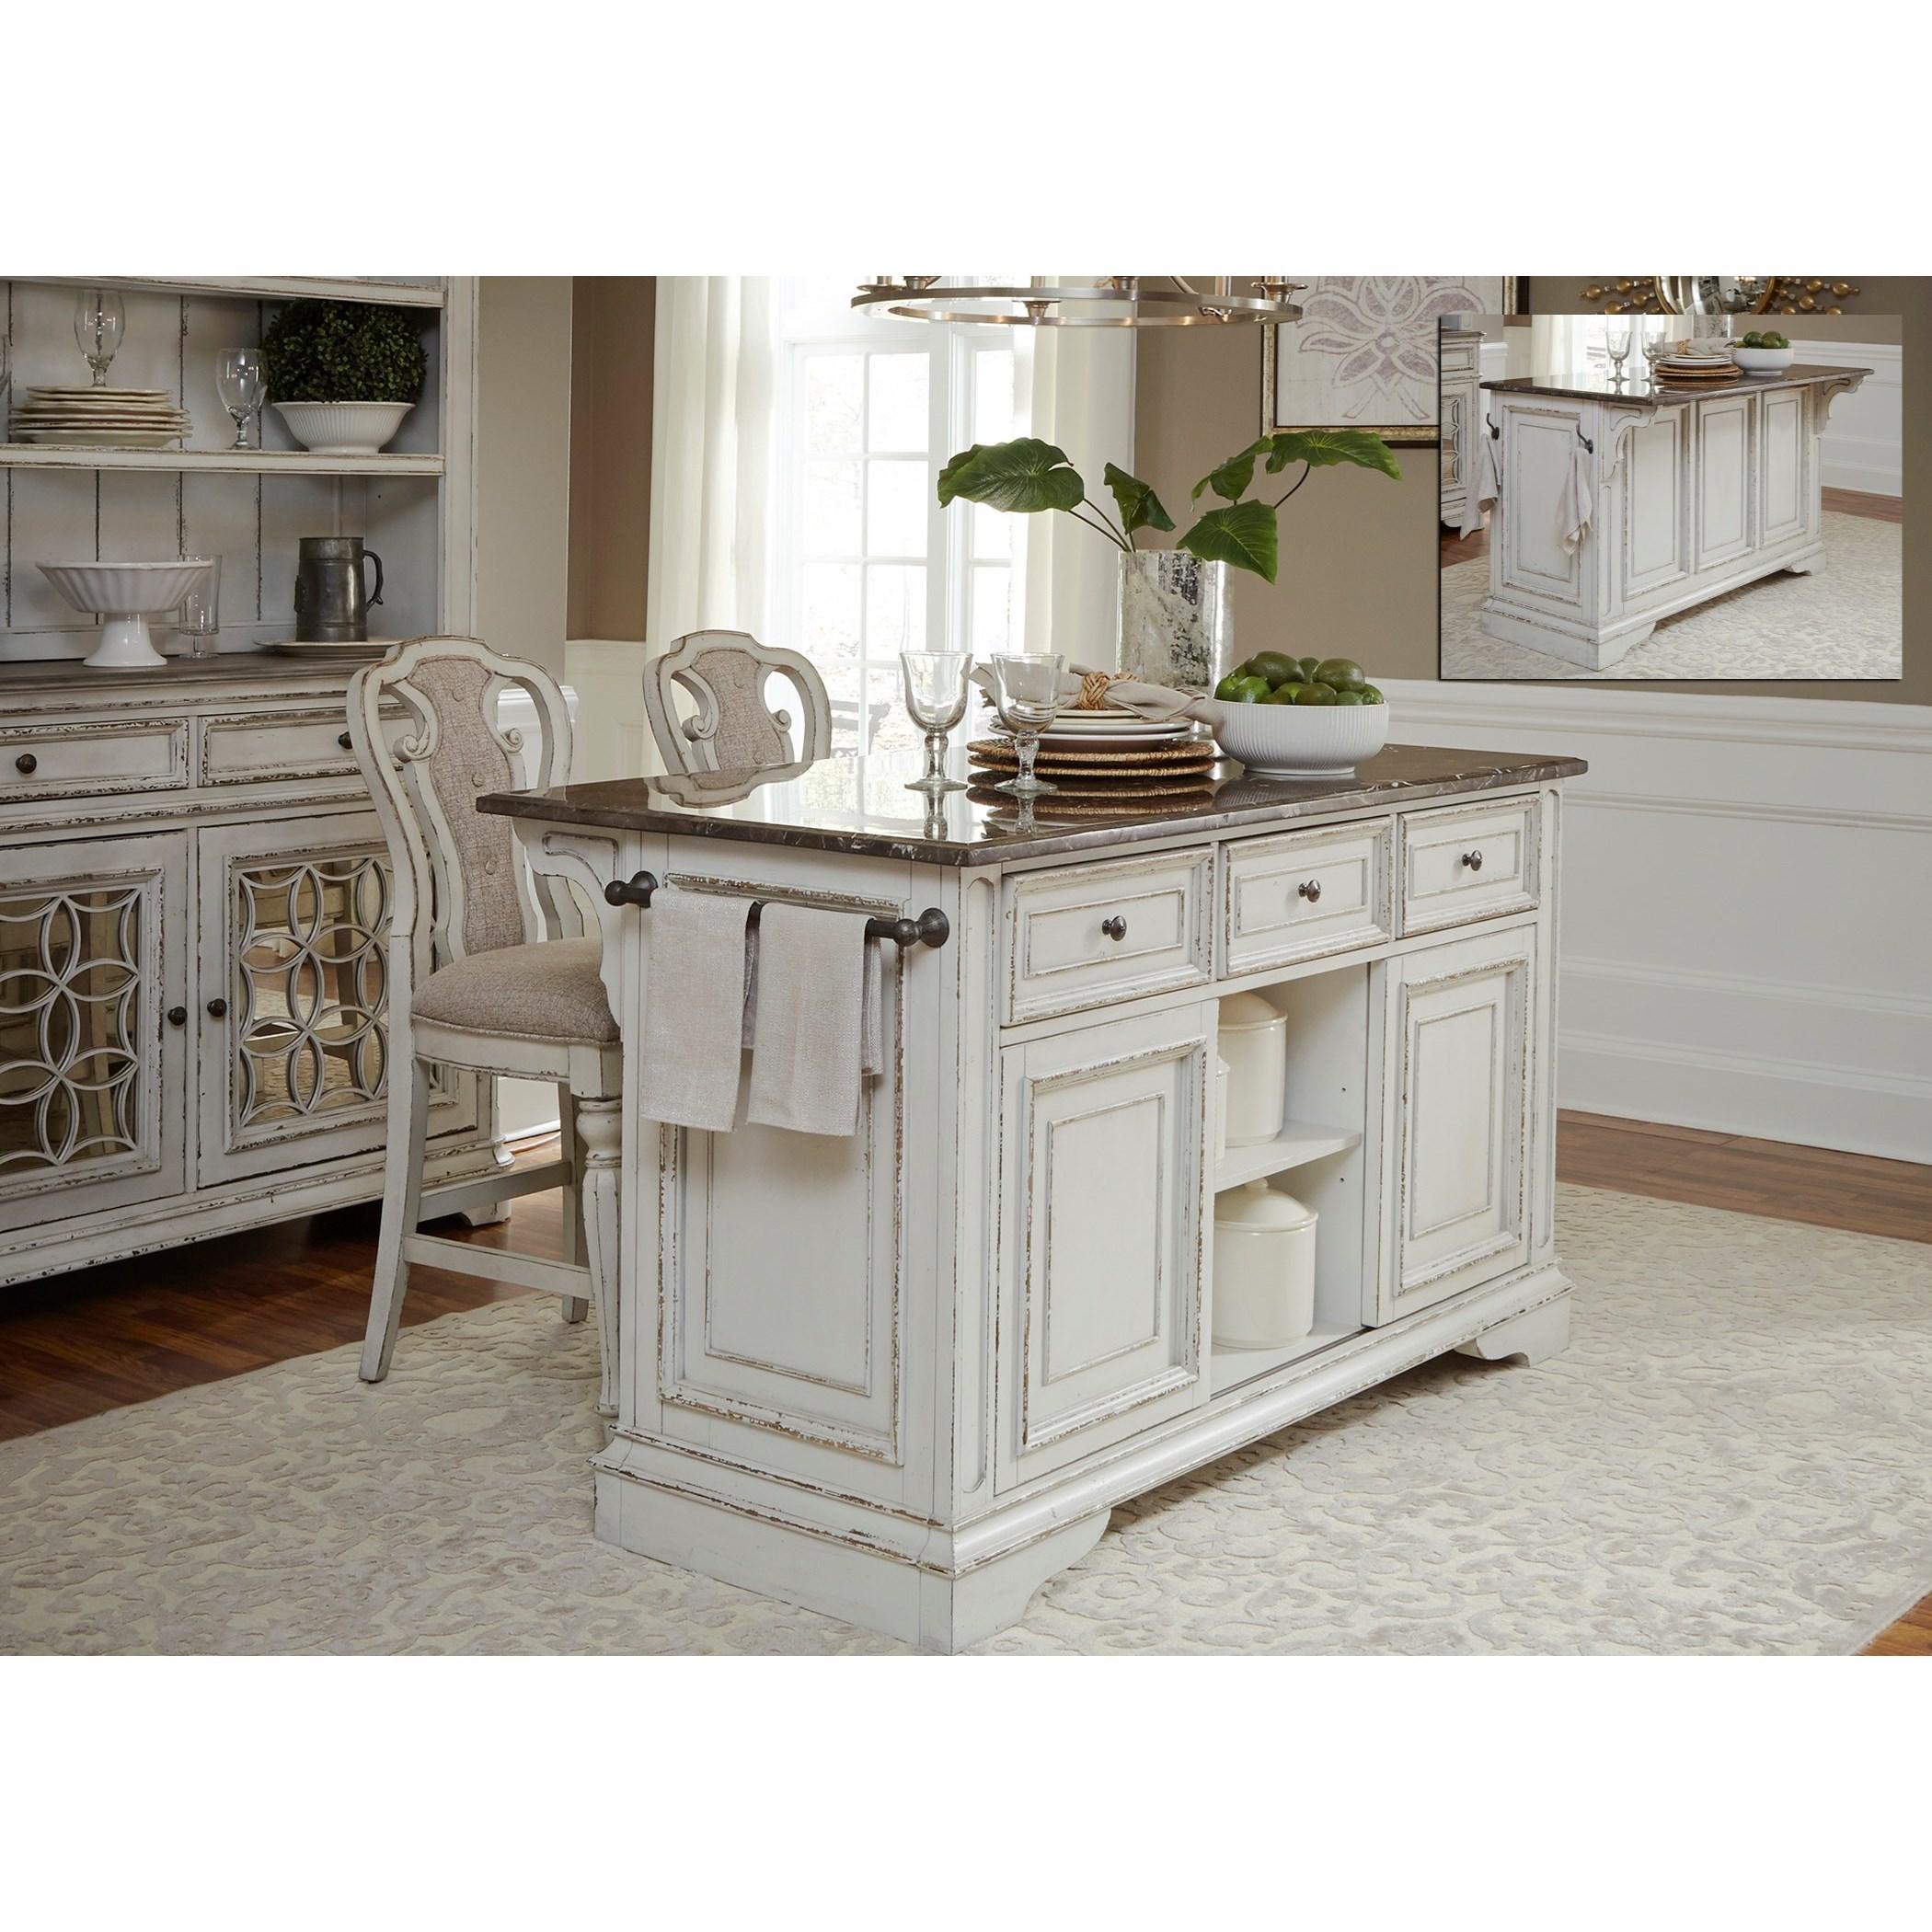 Magnolia Manor Dining Kitchen Island and Stool Set by Liberty Furniture at Bullard Furniture